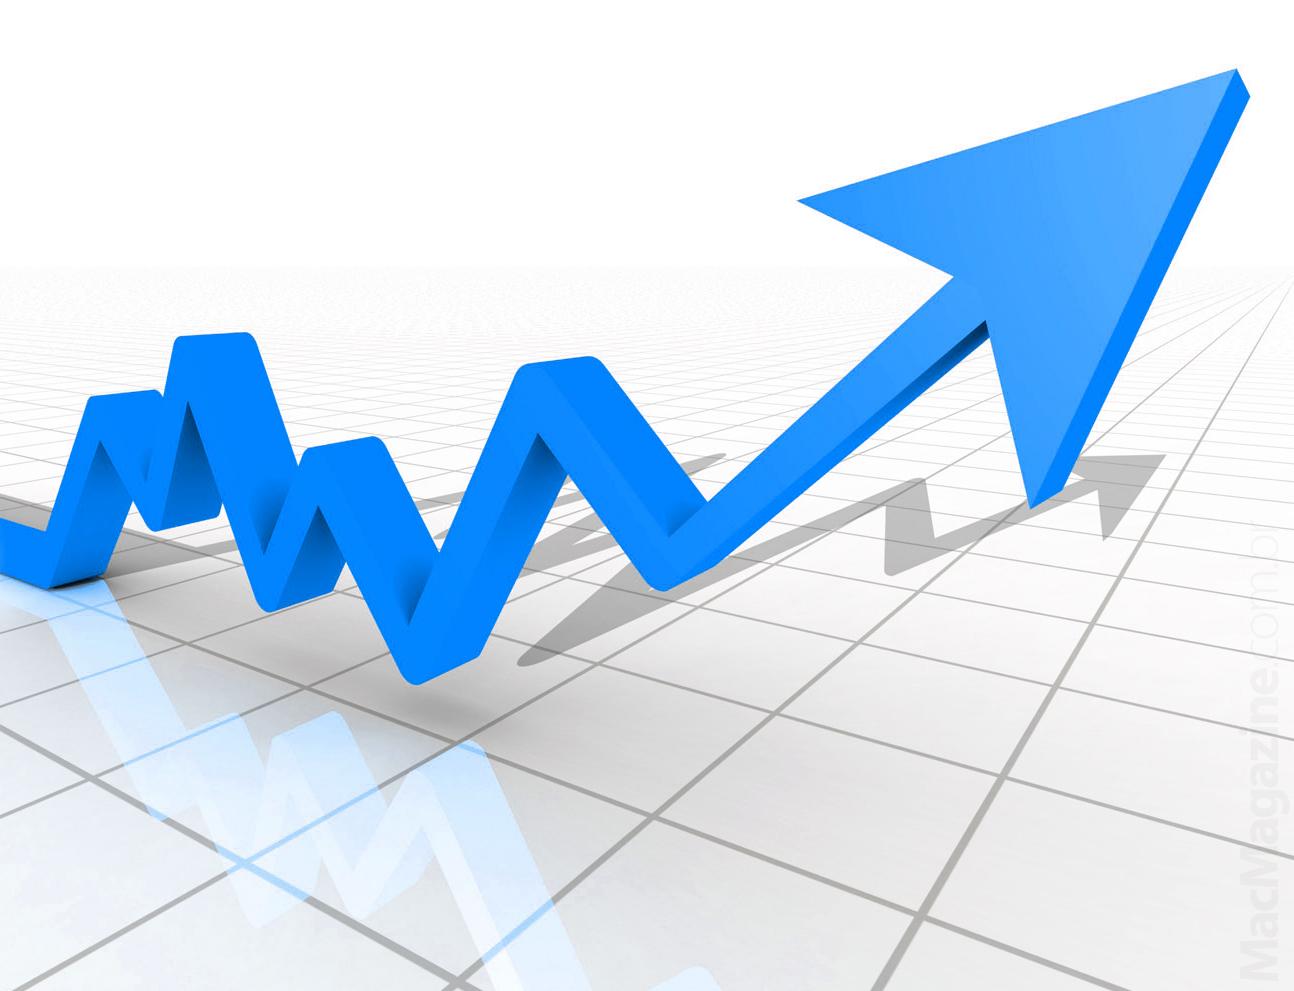 Gráfico apontando para cima